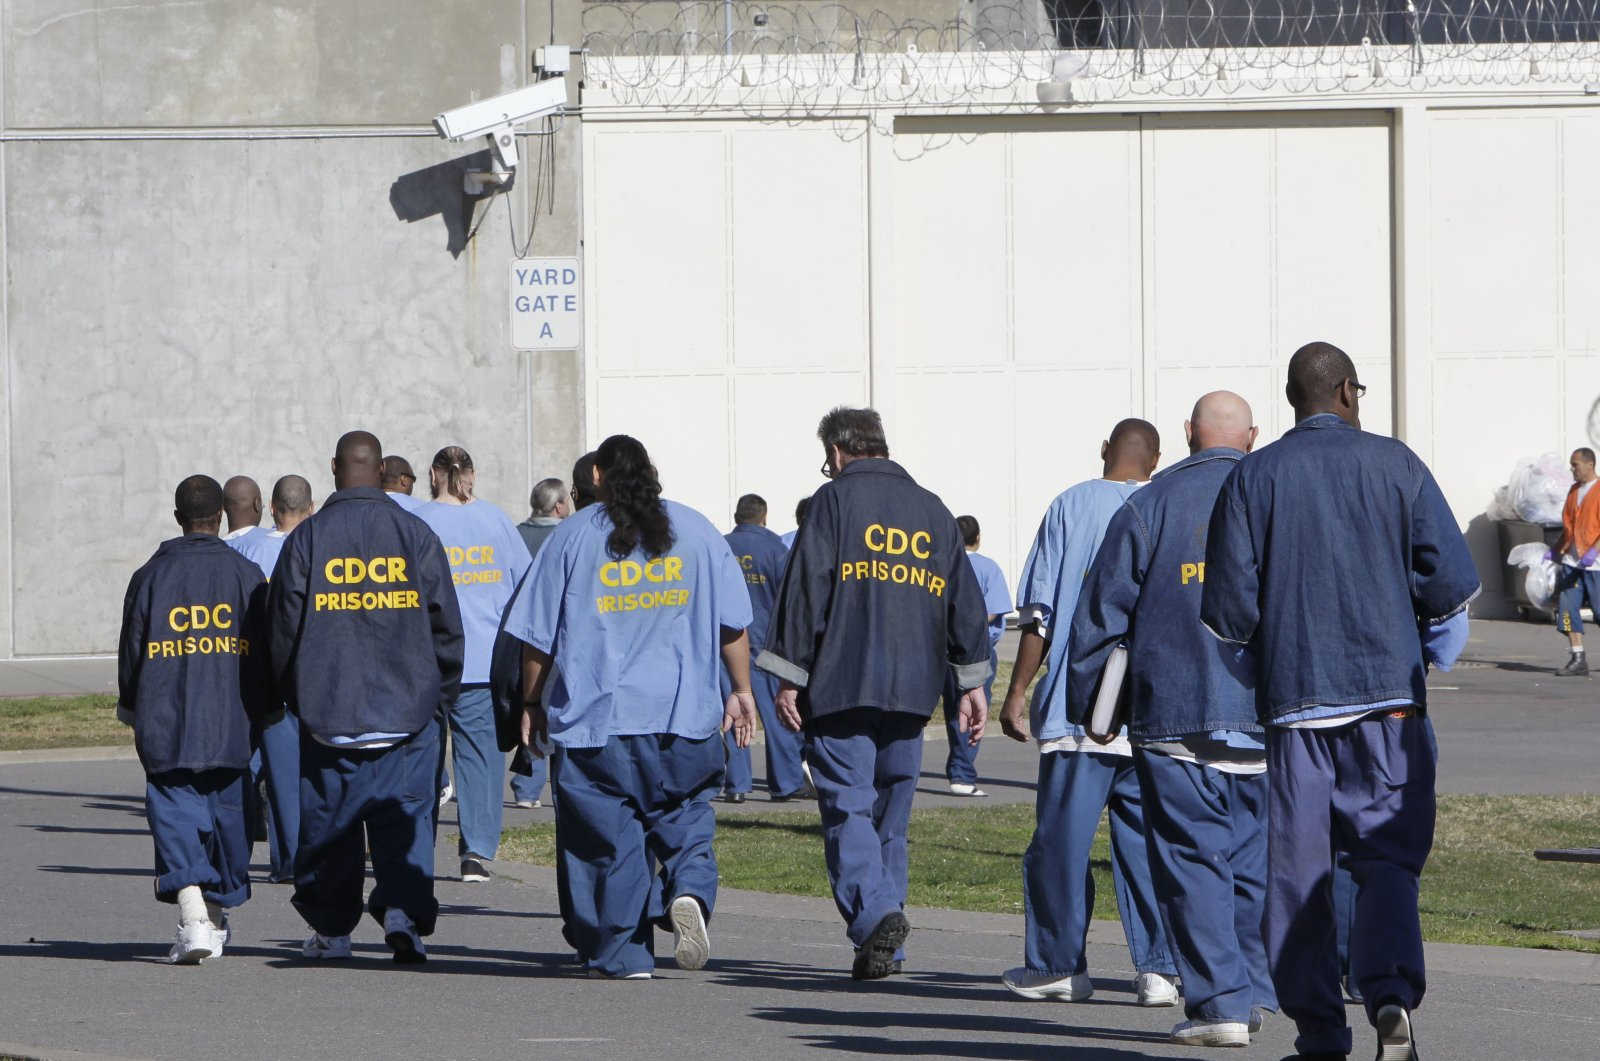 Inmates walk through the exercise yard at California State Prison, Sacramento, Calif., Thursday, Feb. 26, 2013. (AP Photo)